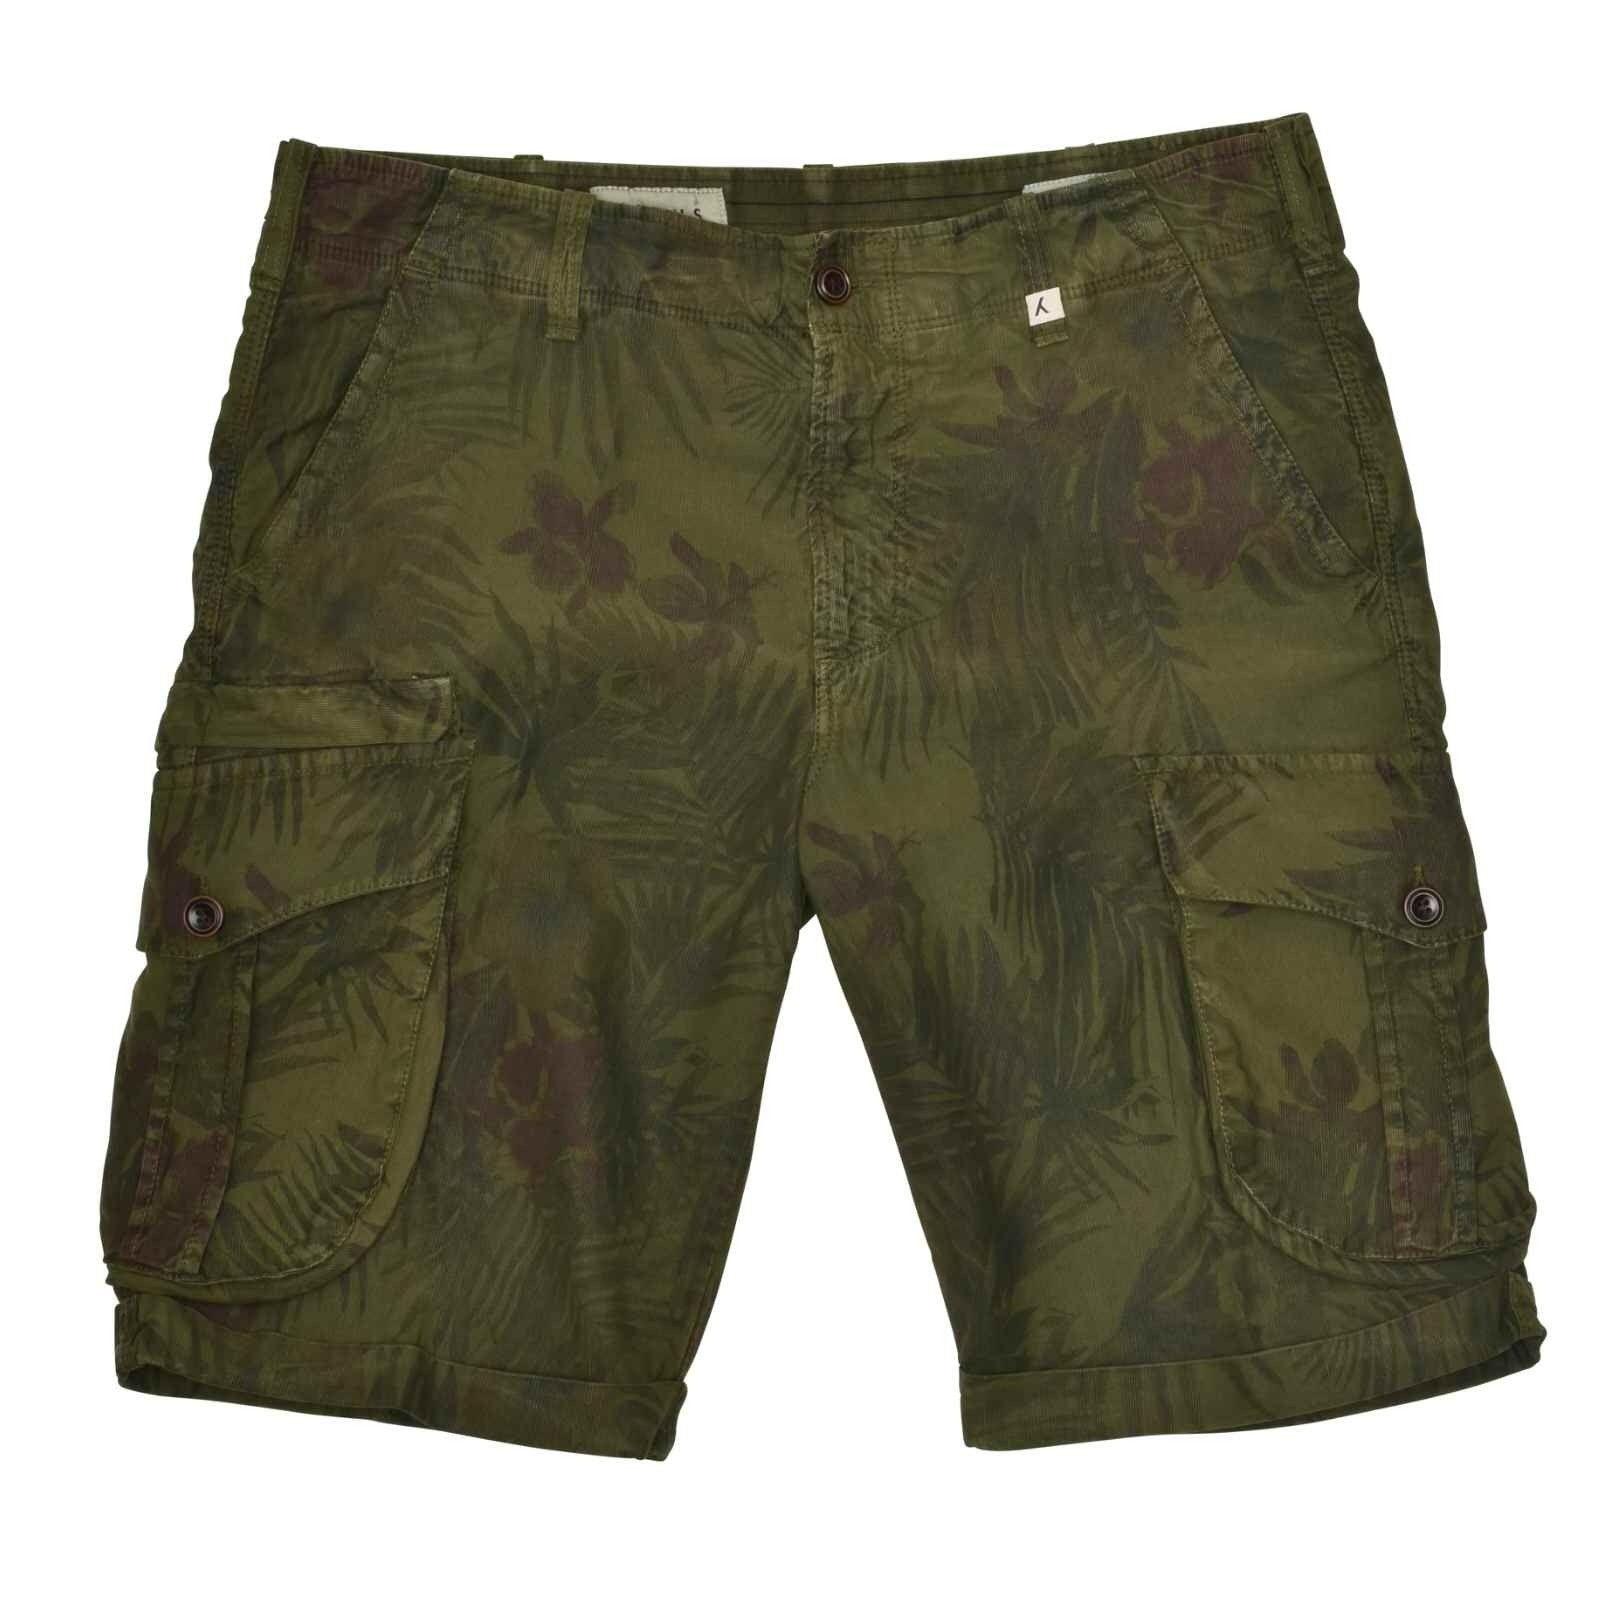 MYTHS - Herren Shorts - Short Cargo Trousers - Green Jungle